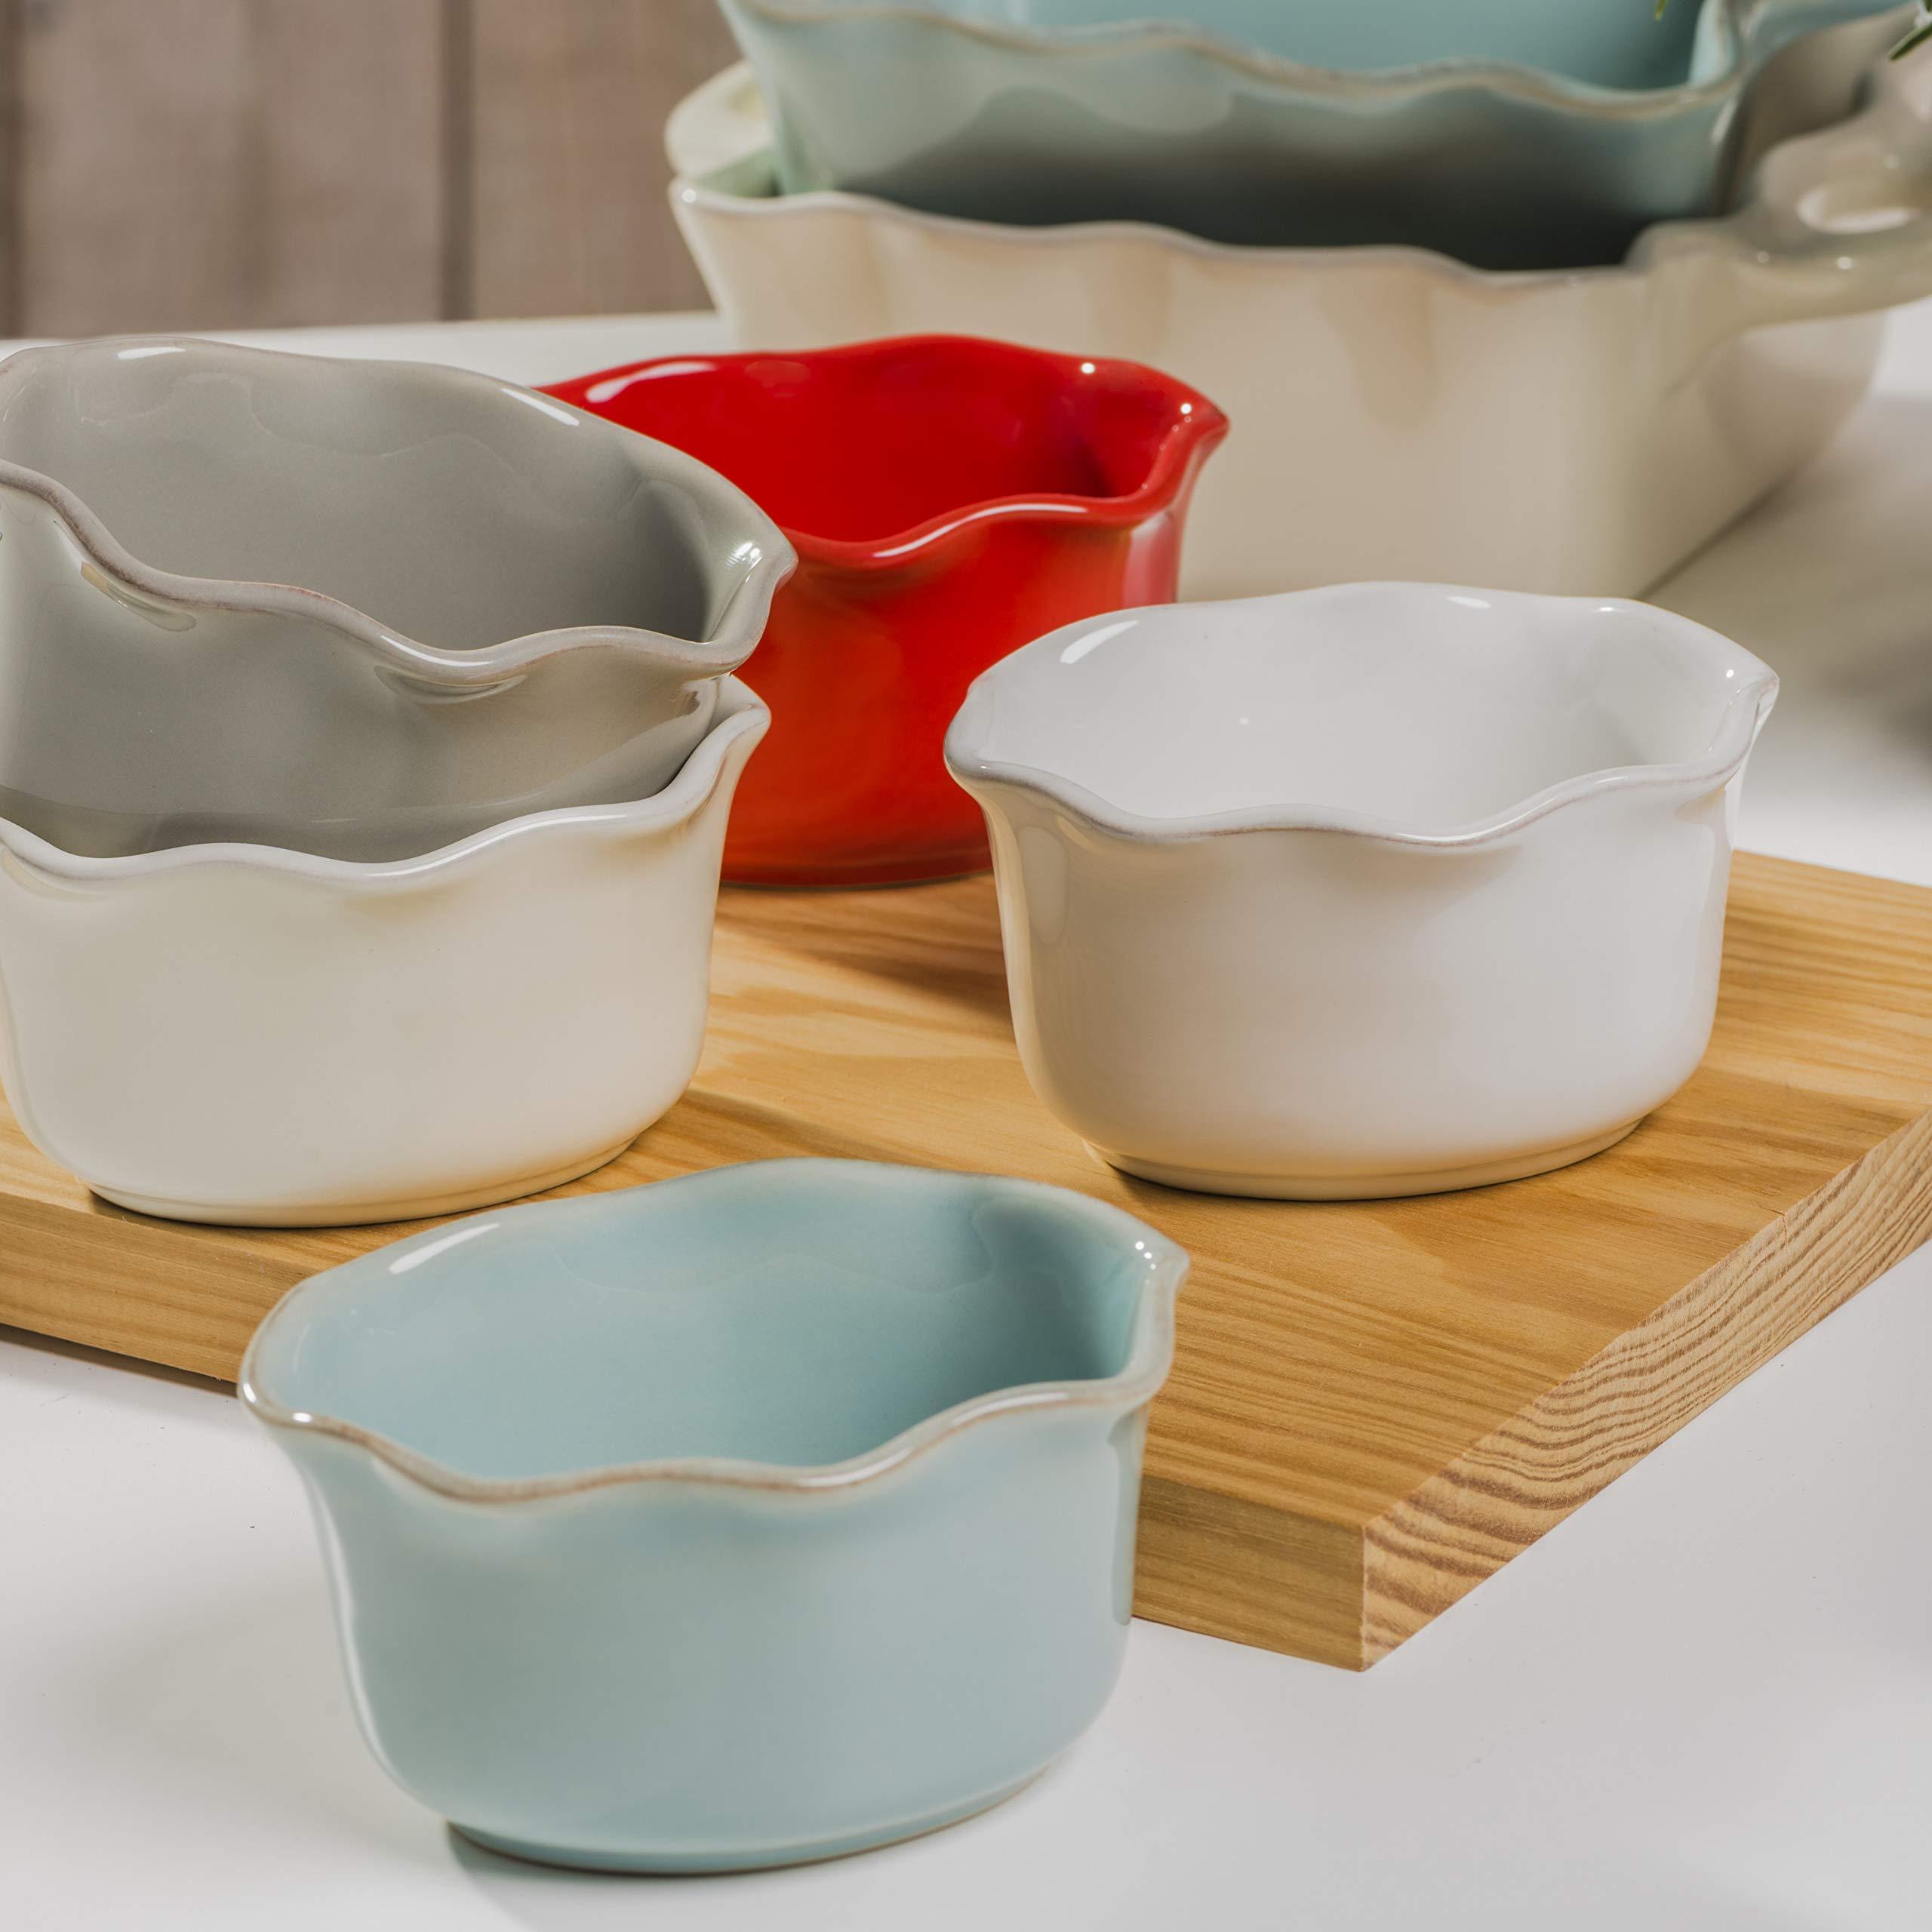 Casafina Cook & Host Collection Stoneware Ceramic Ruffled Ramekin 4.5'' (Set 4), Grey by Casafina (Image #2)